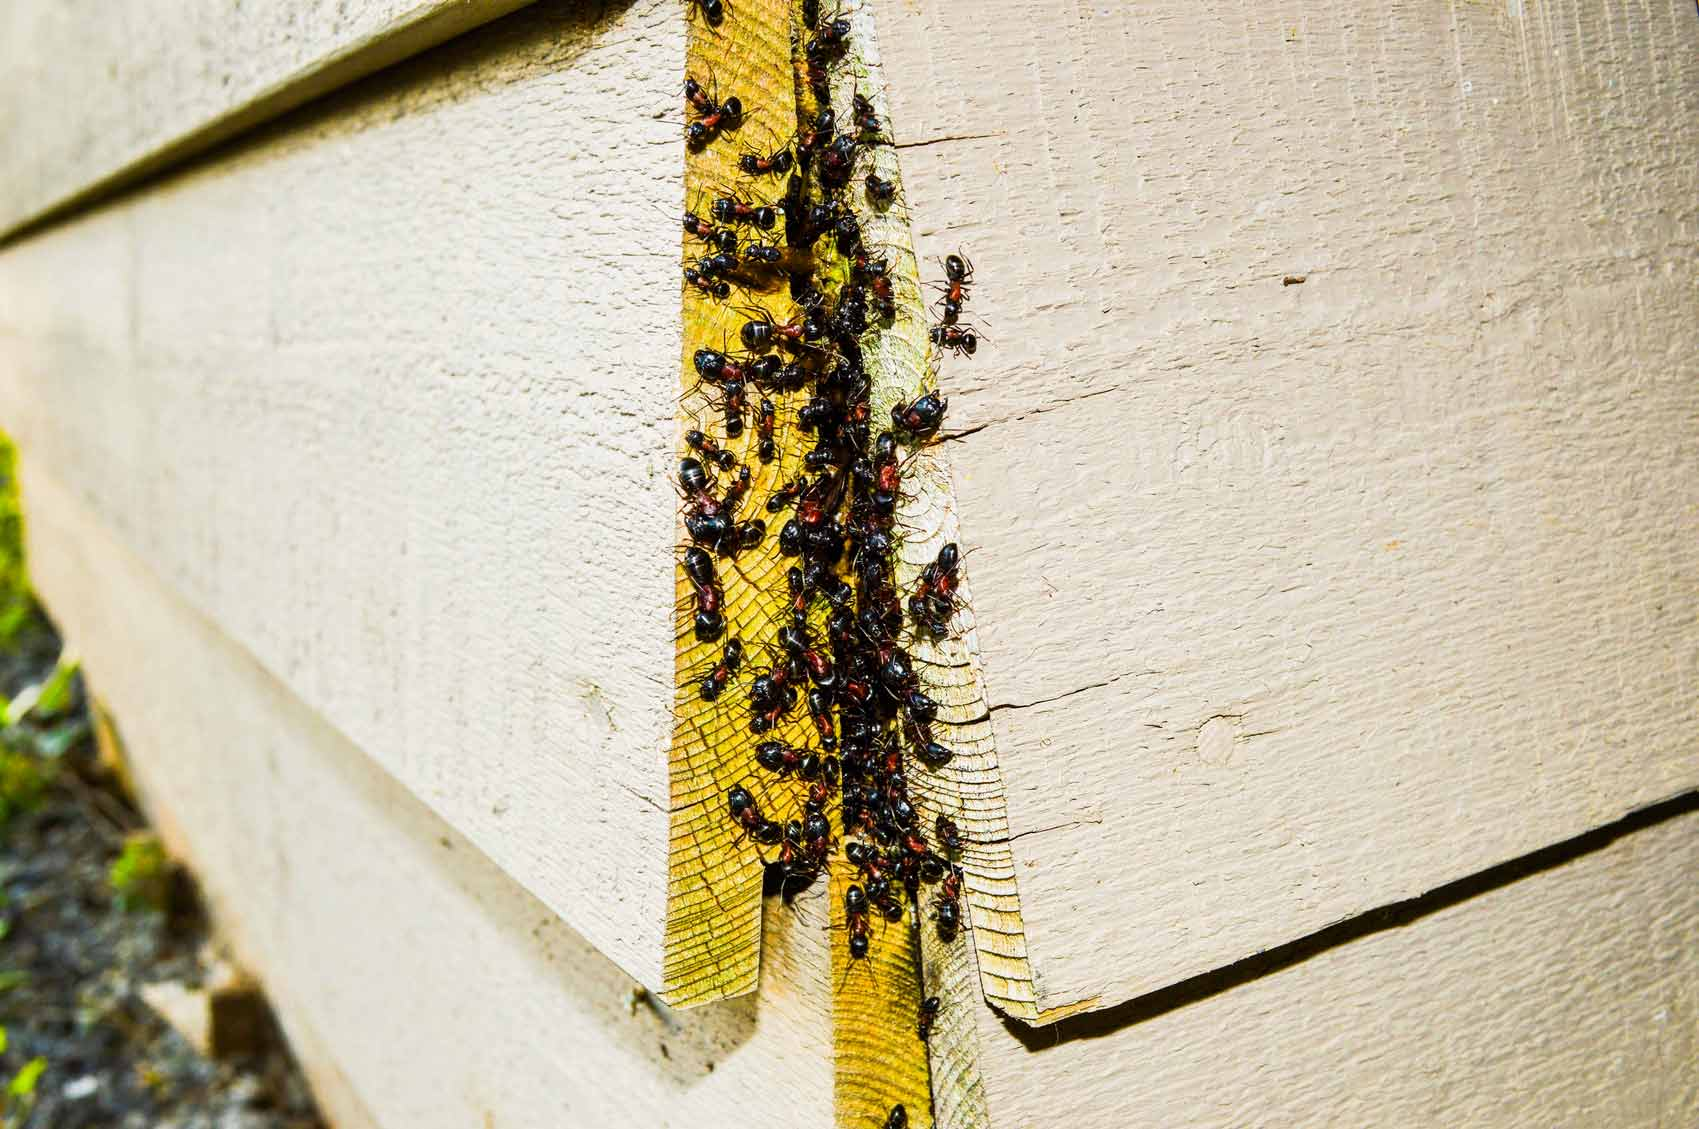 ants under siding